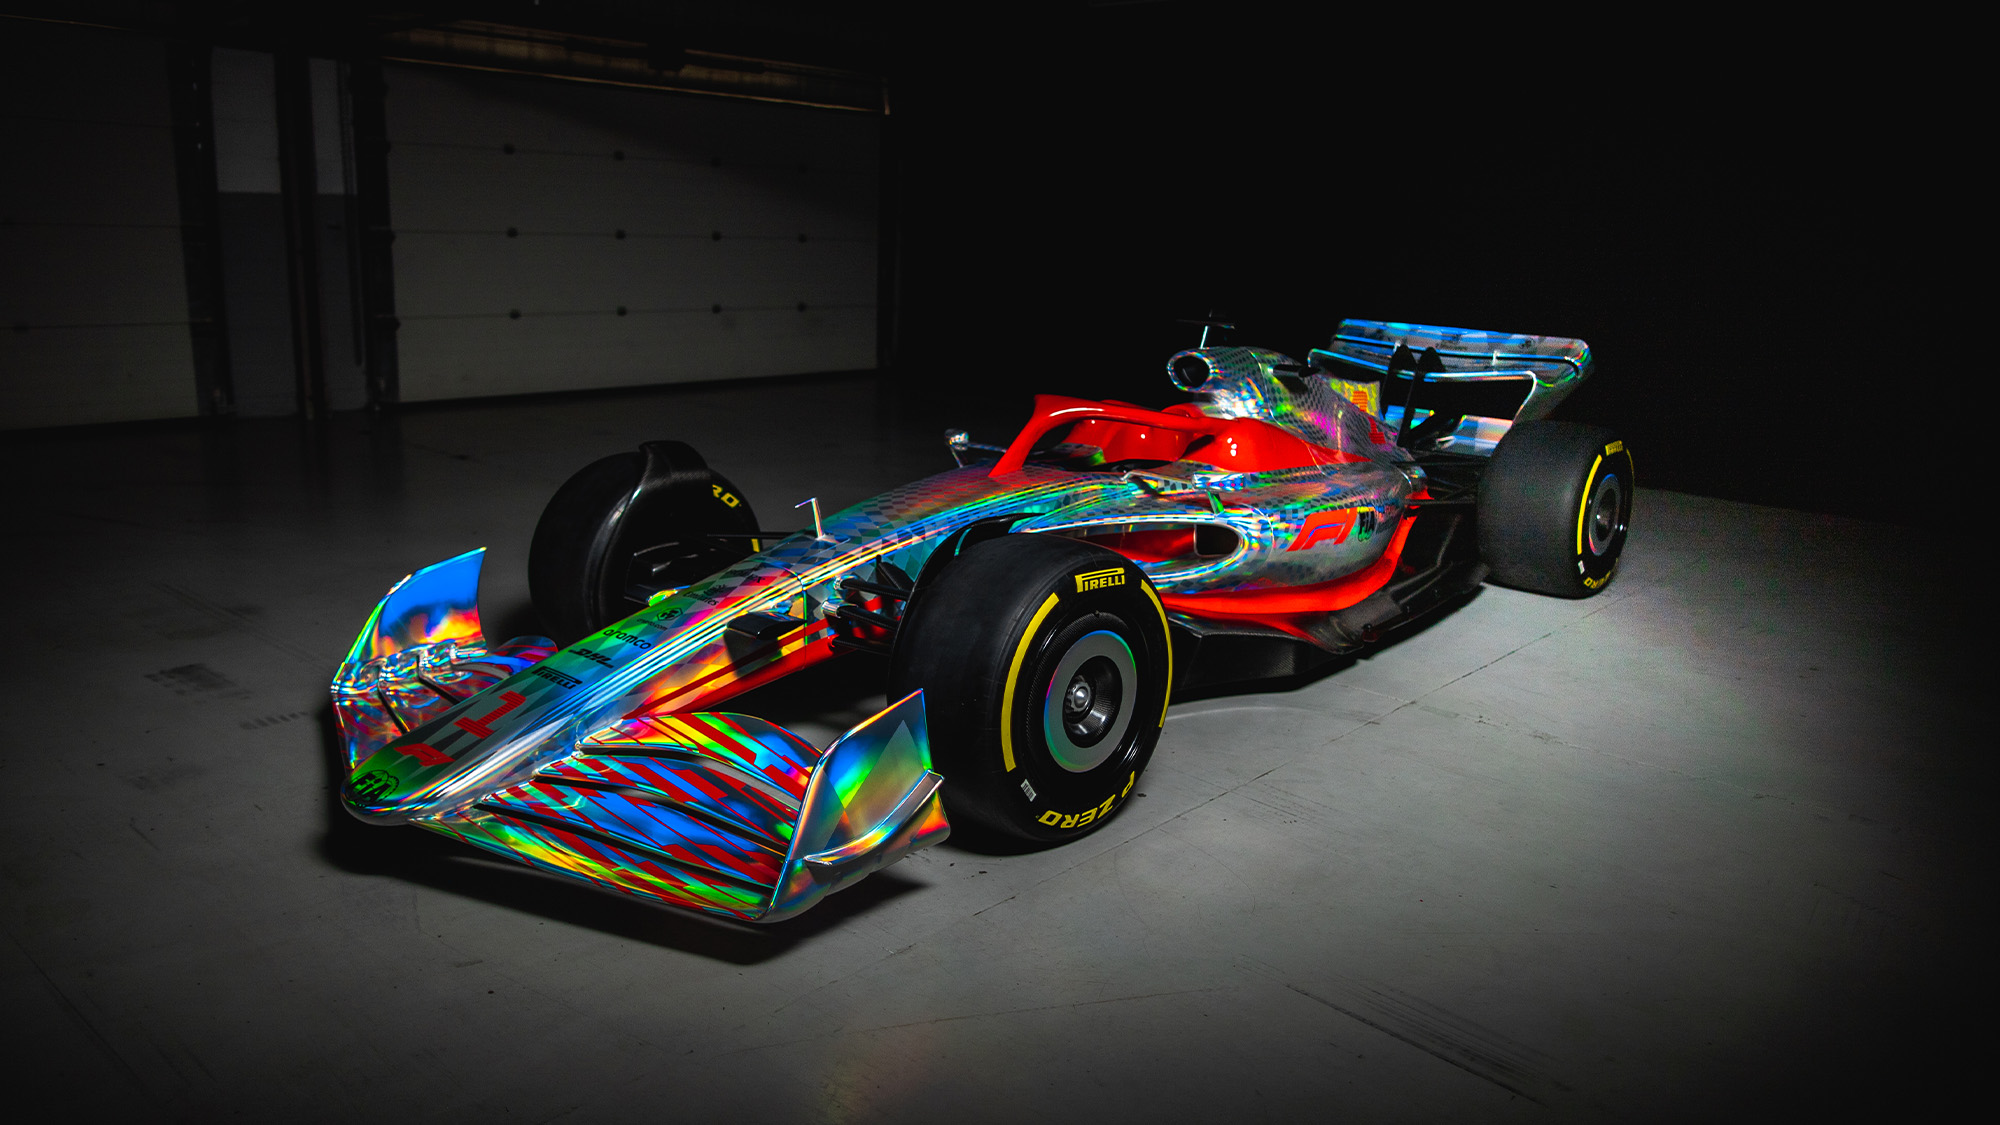 F1 2022 car 1-1 model ftq view